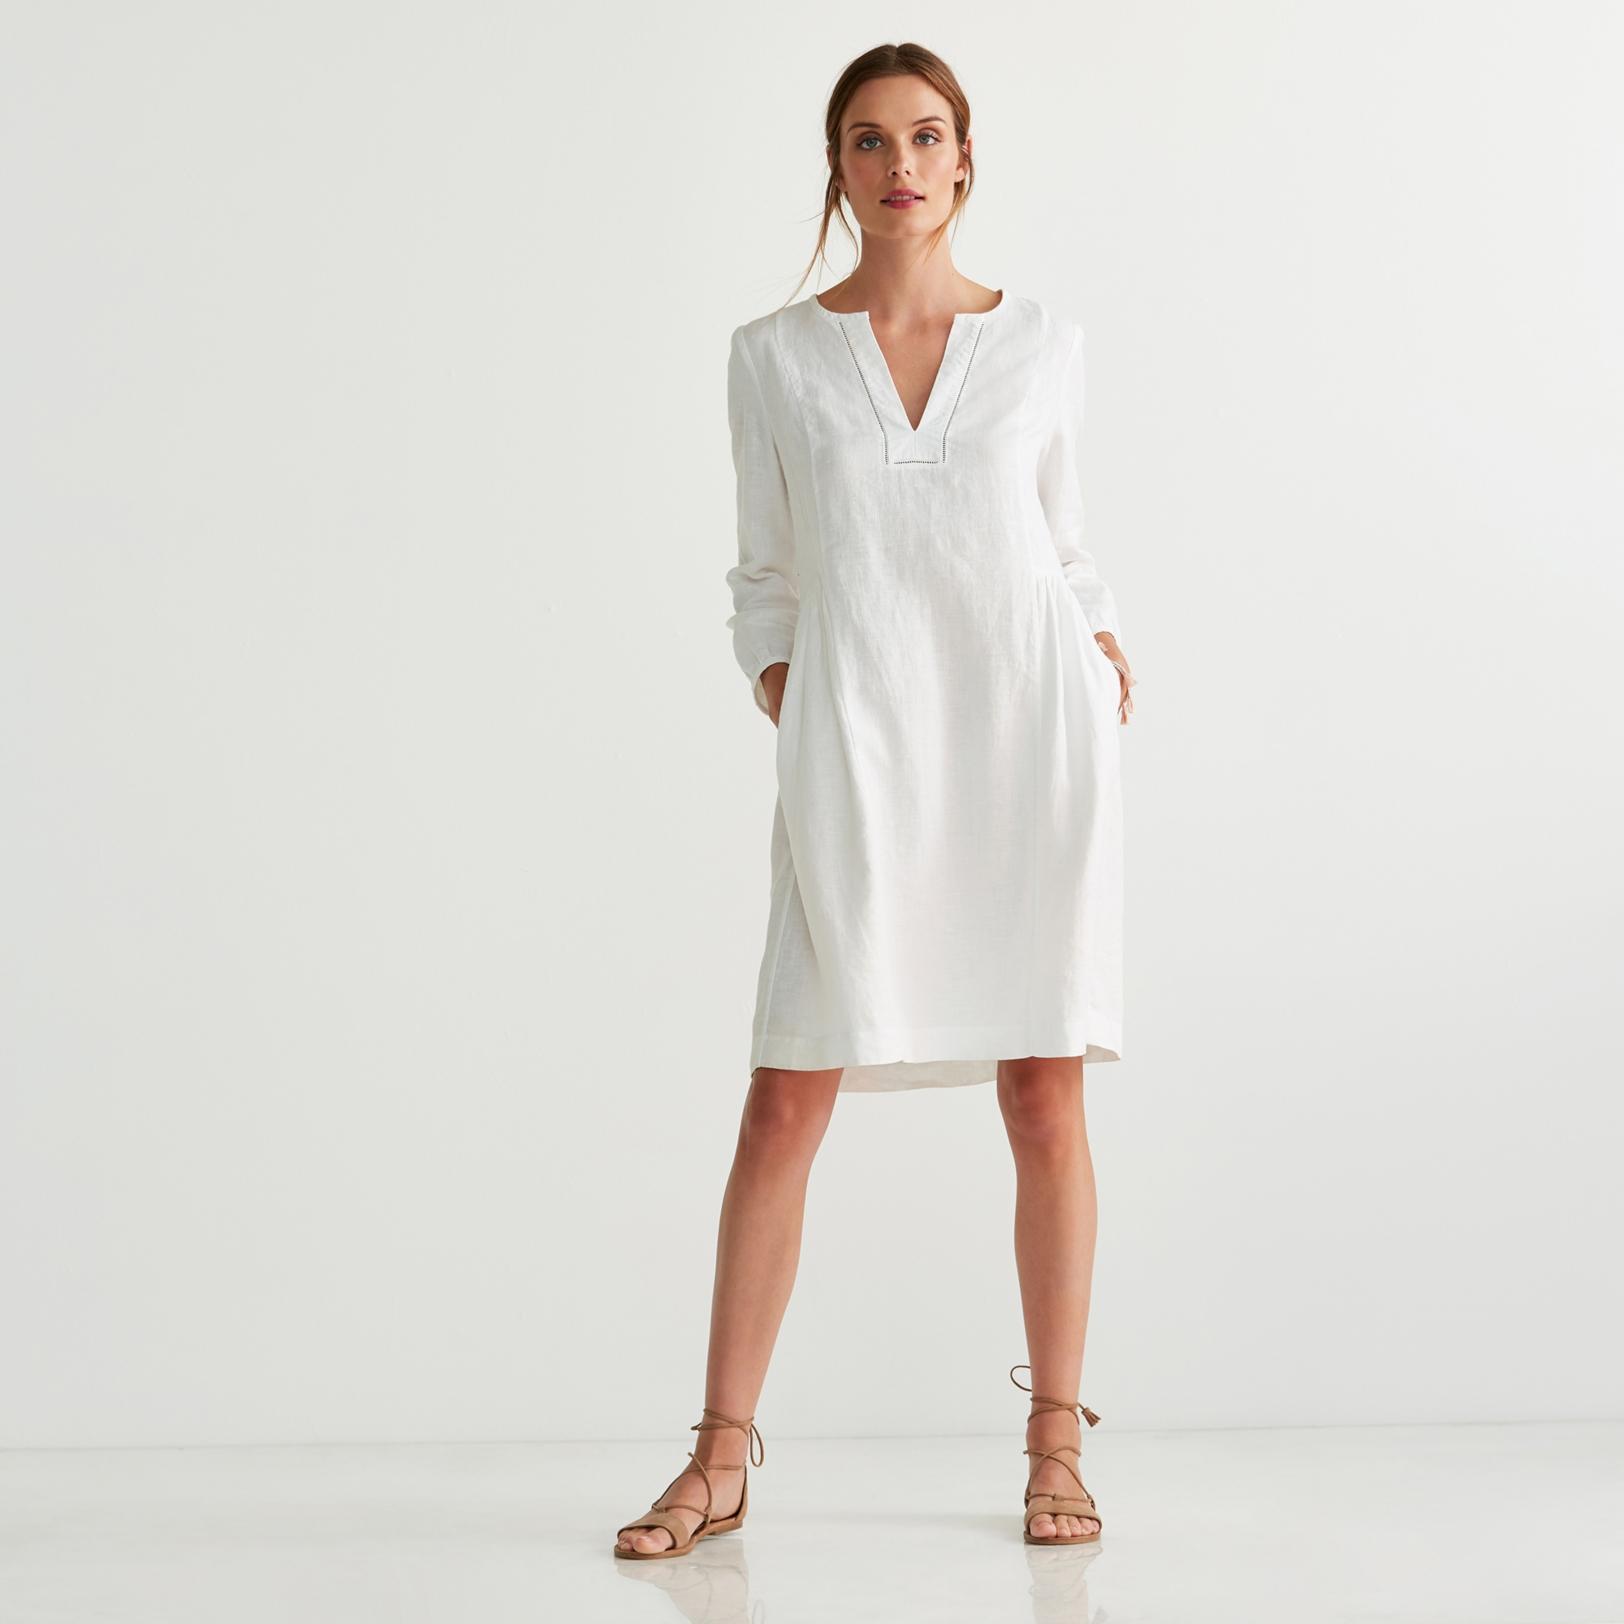 Linen Gathered Dress | Dresses & Tunics | The White Company UK